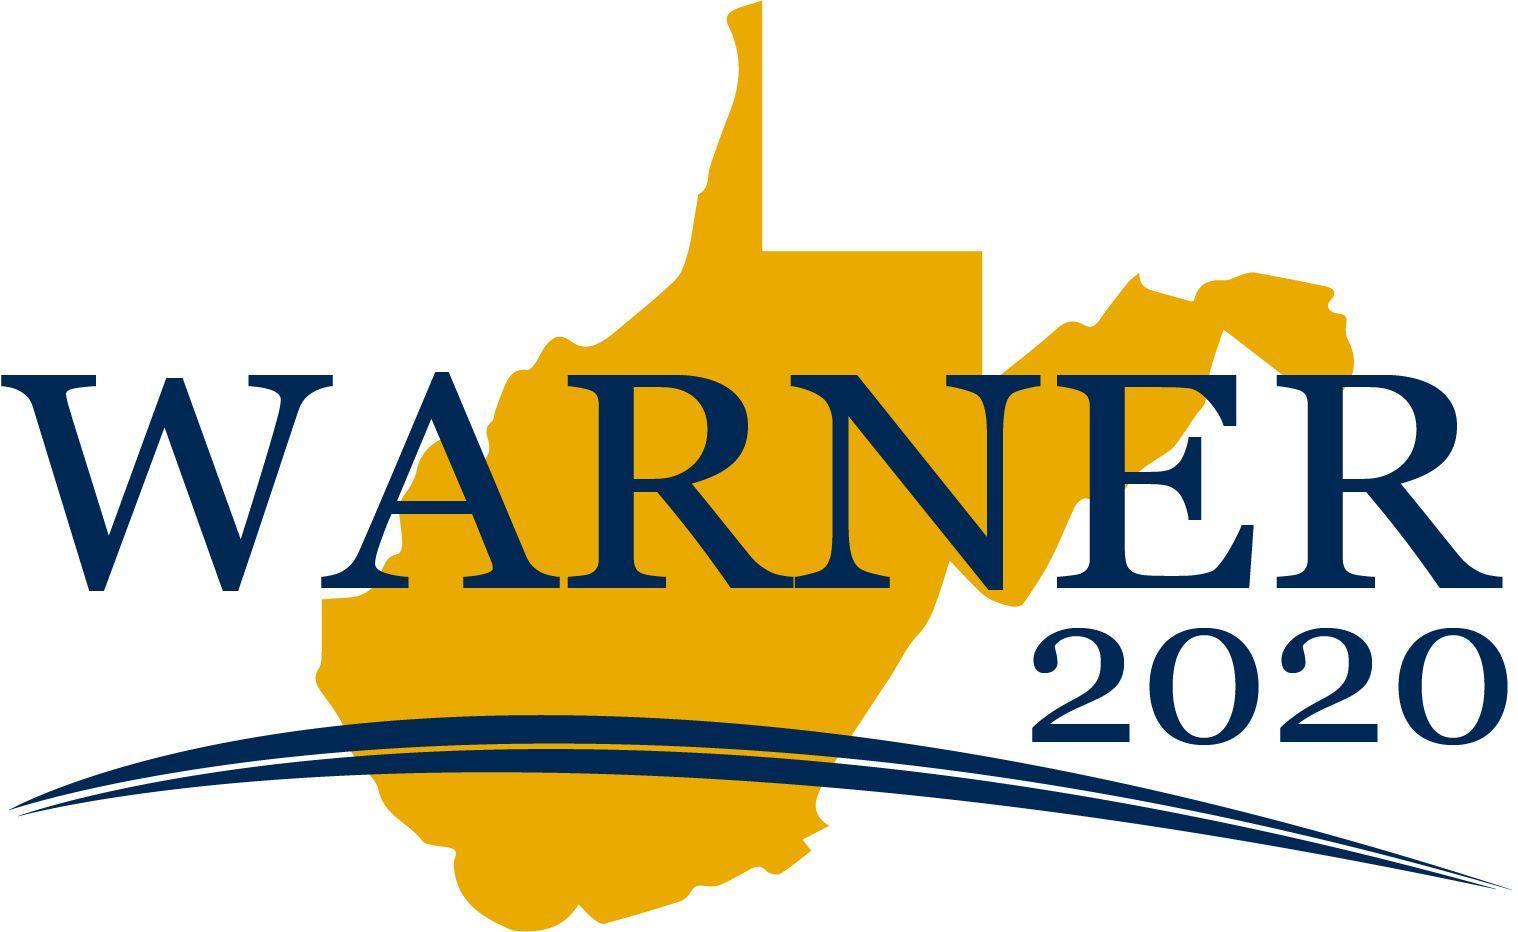 Warner logo 2020 1